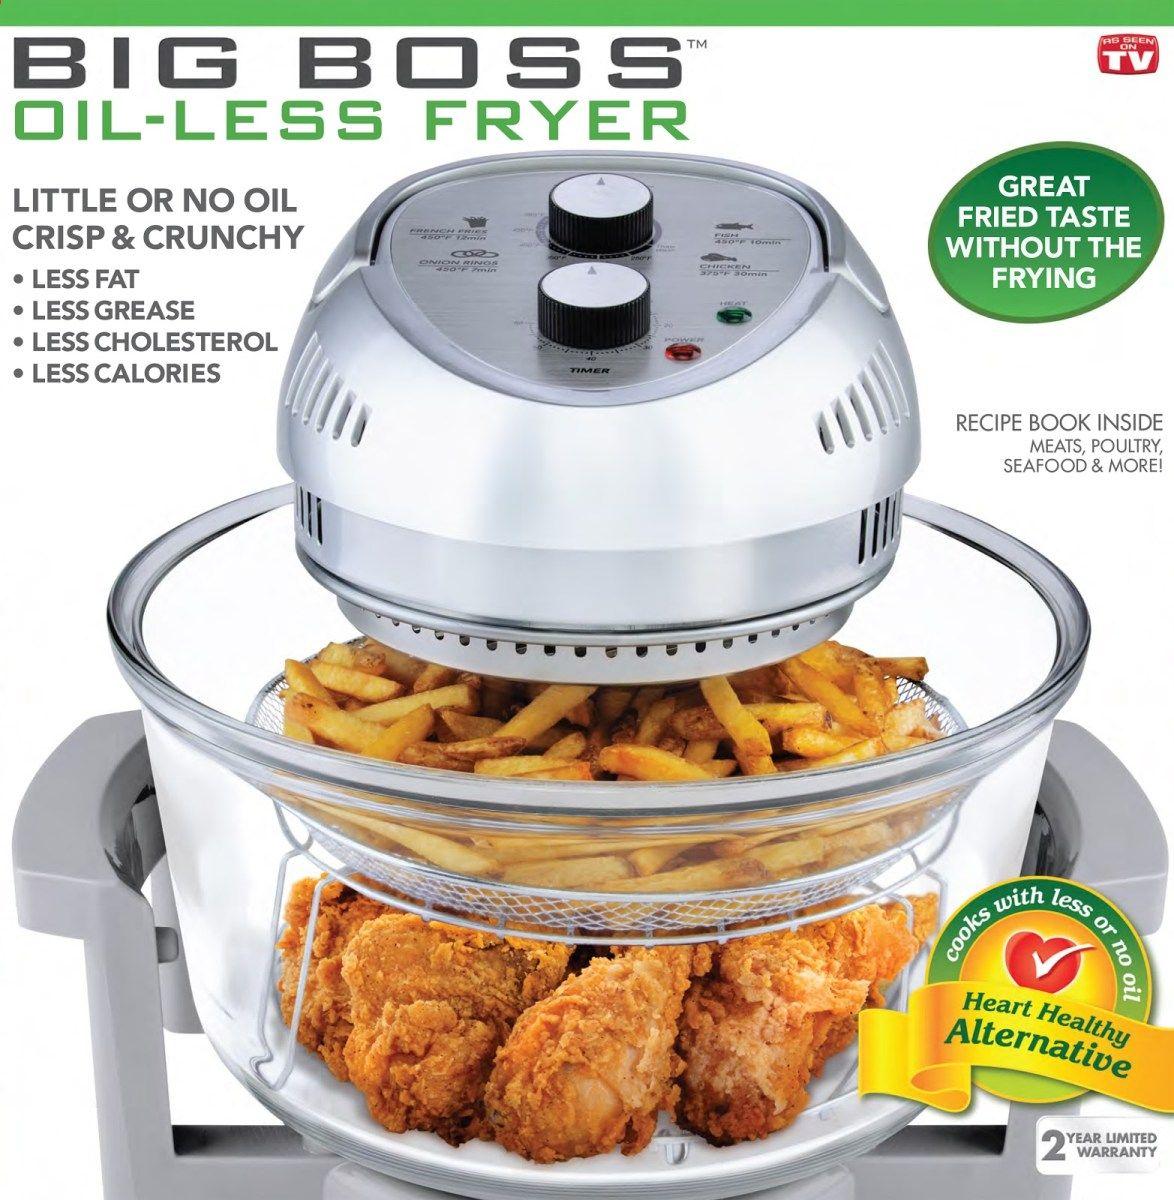 Big Boss Oil Less Fryer Manual Recipes Air Fryer Recipes Healthy Cooking